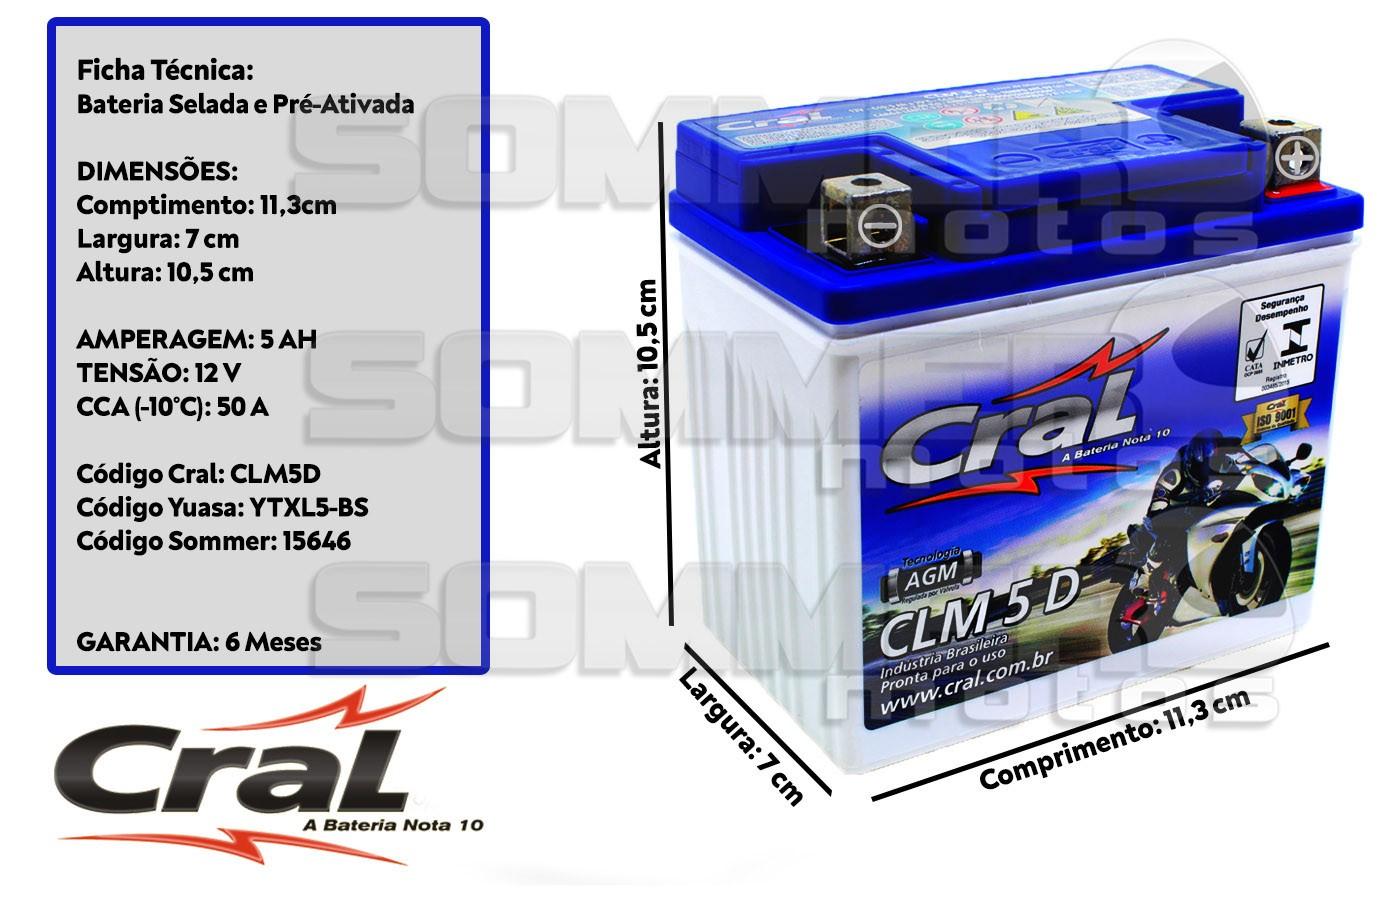 BATERIA KTM EXC 250/450- AMAZONAS AME 125 ORIGINAL CRAL(CLM5D-YTX5LBS)